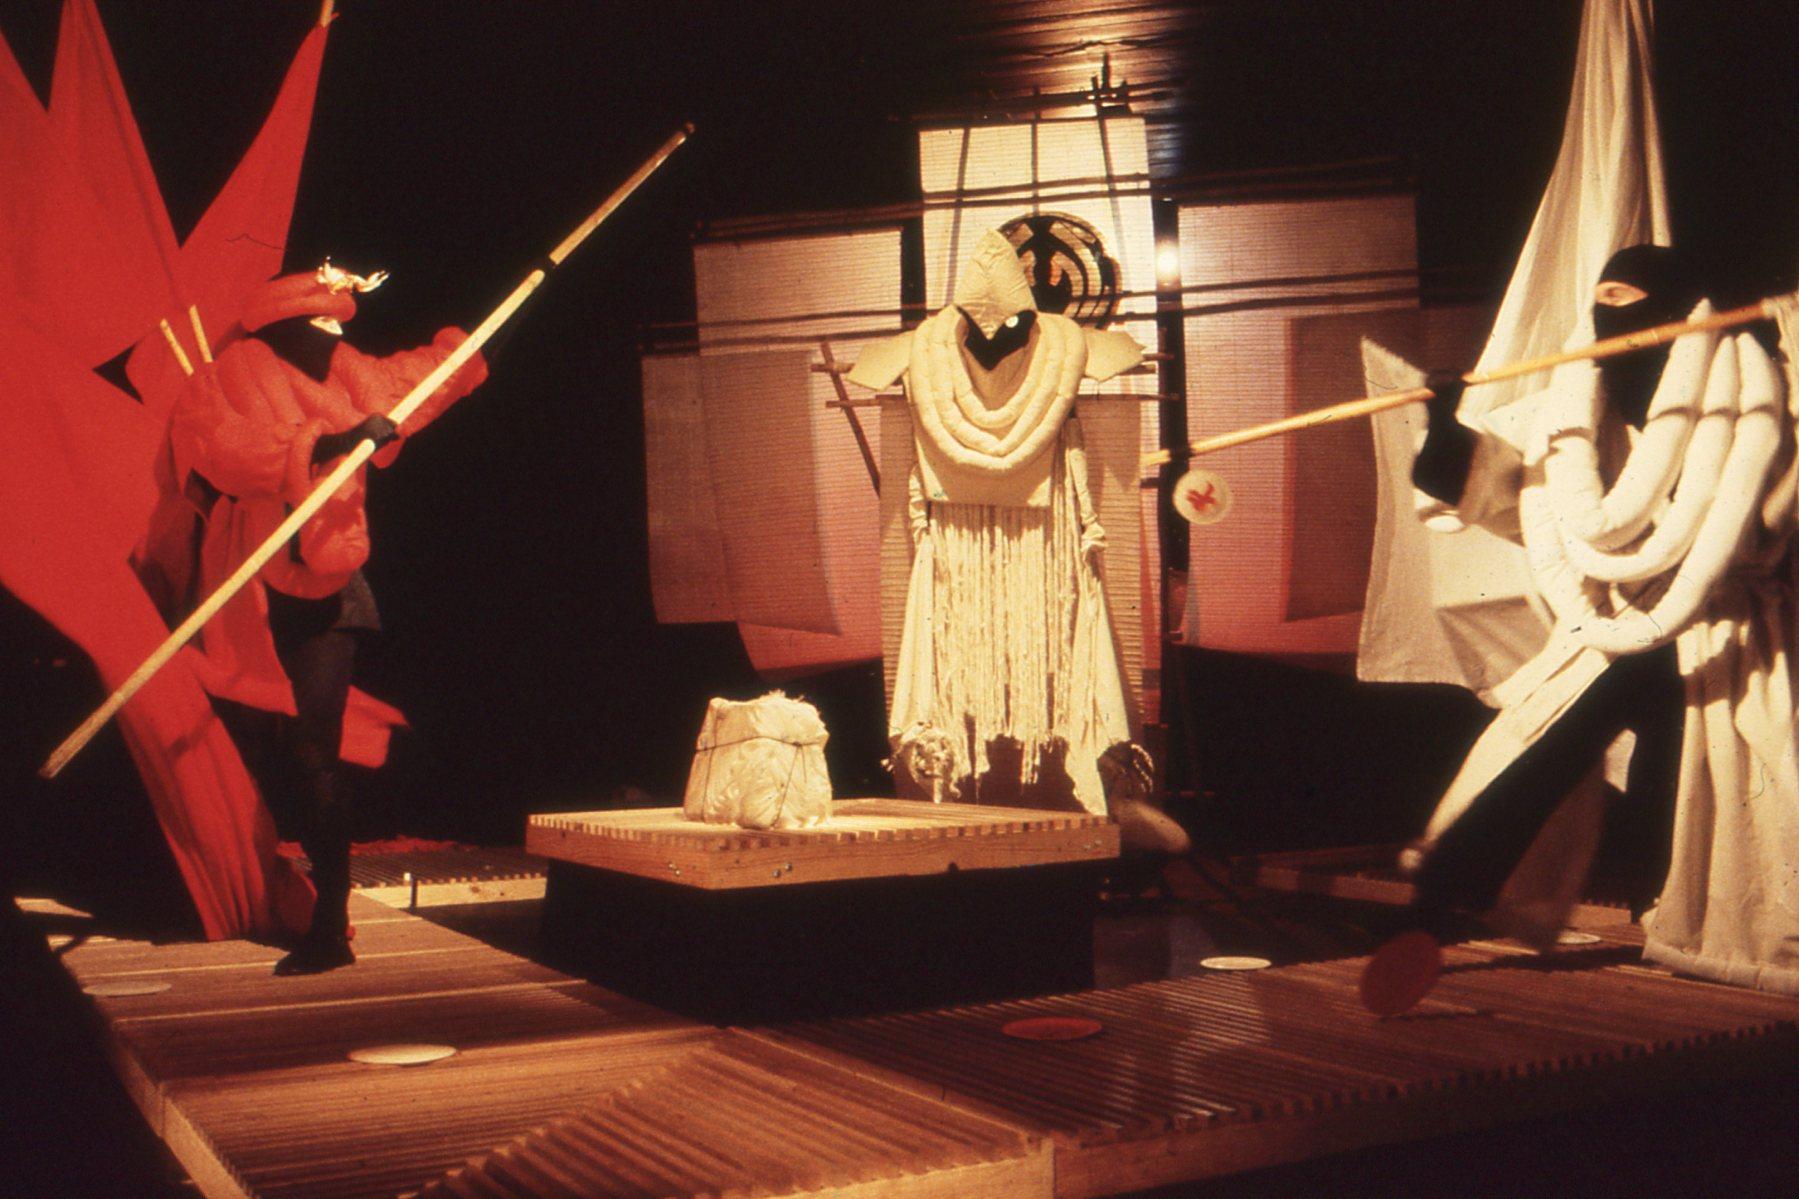 <em>Se<em>c</em>rets</em> (1983) par Handspan Theatre Company (Melbourne, Australie, 1977-2002), un spe<em>c</em>ta<em>c</em>le ave<em>c</em> des marionnettes et de l'imagerie visuelle, <em>c</em>on<em>c</em>eption, s<em>c</em>énographie et mise en s<em>c</em>ène : Nigel Triffitt. Photo: Ken Evans